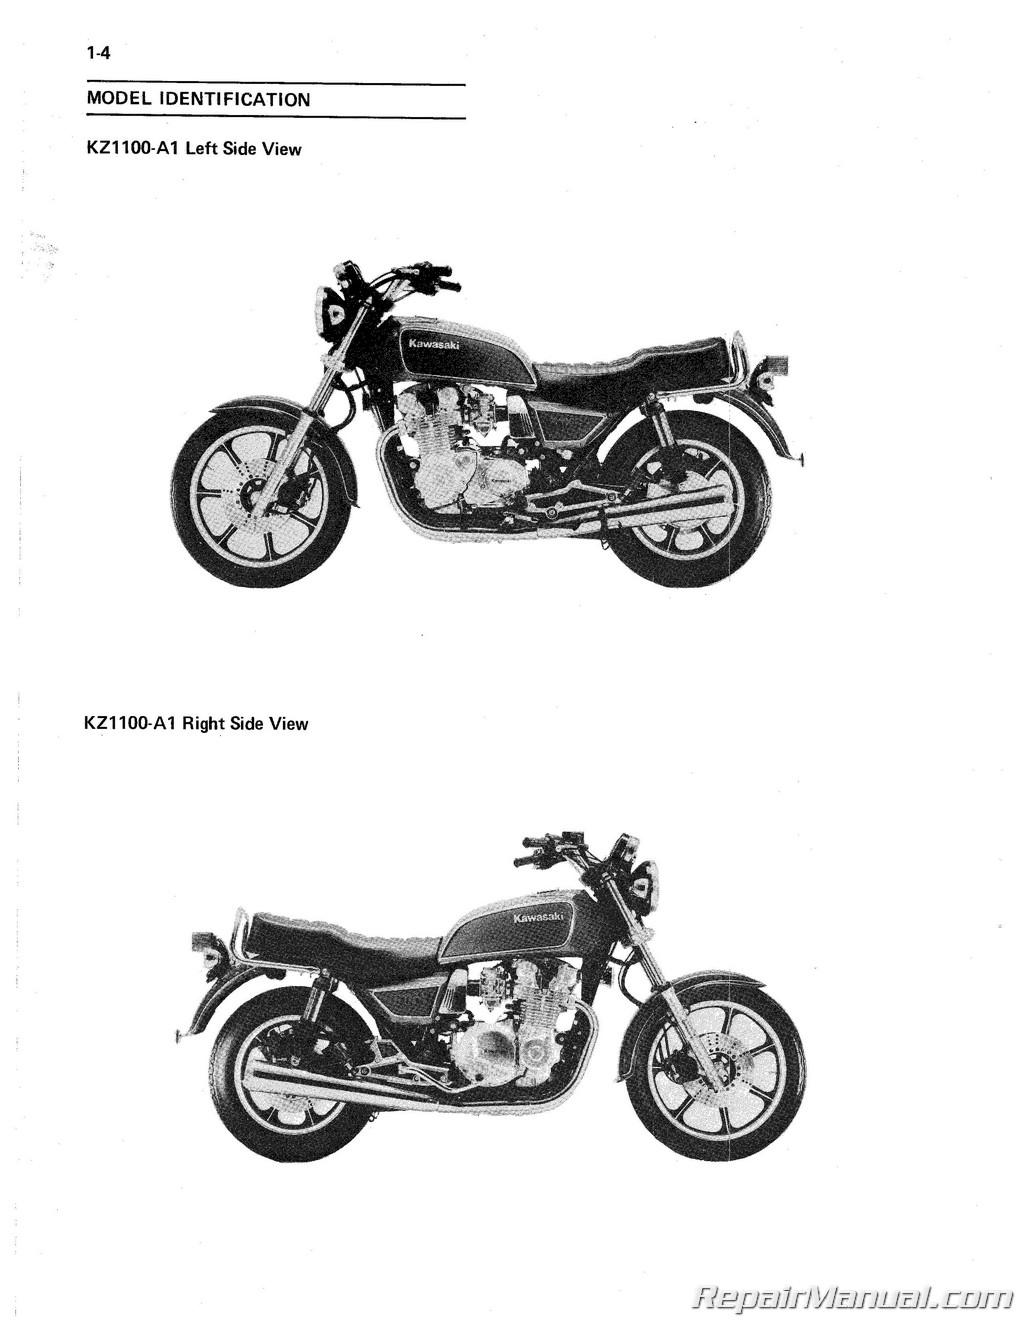 hight resolution of kawasaki 1981 1983 kz1100 1984 1985 zn1100 shaft drive motorcycle service manual